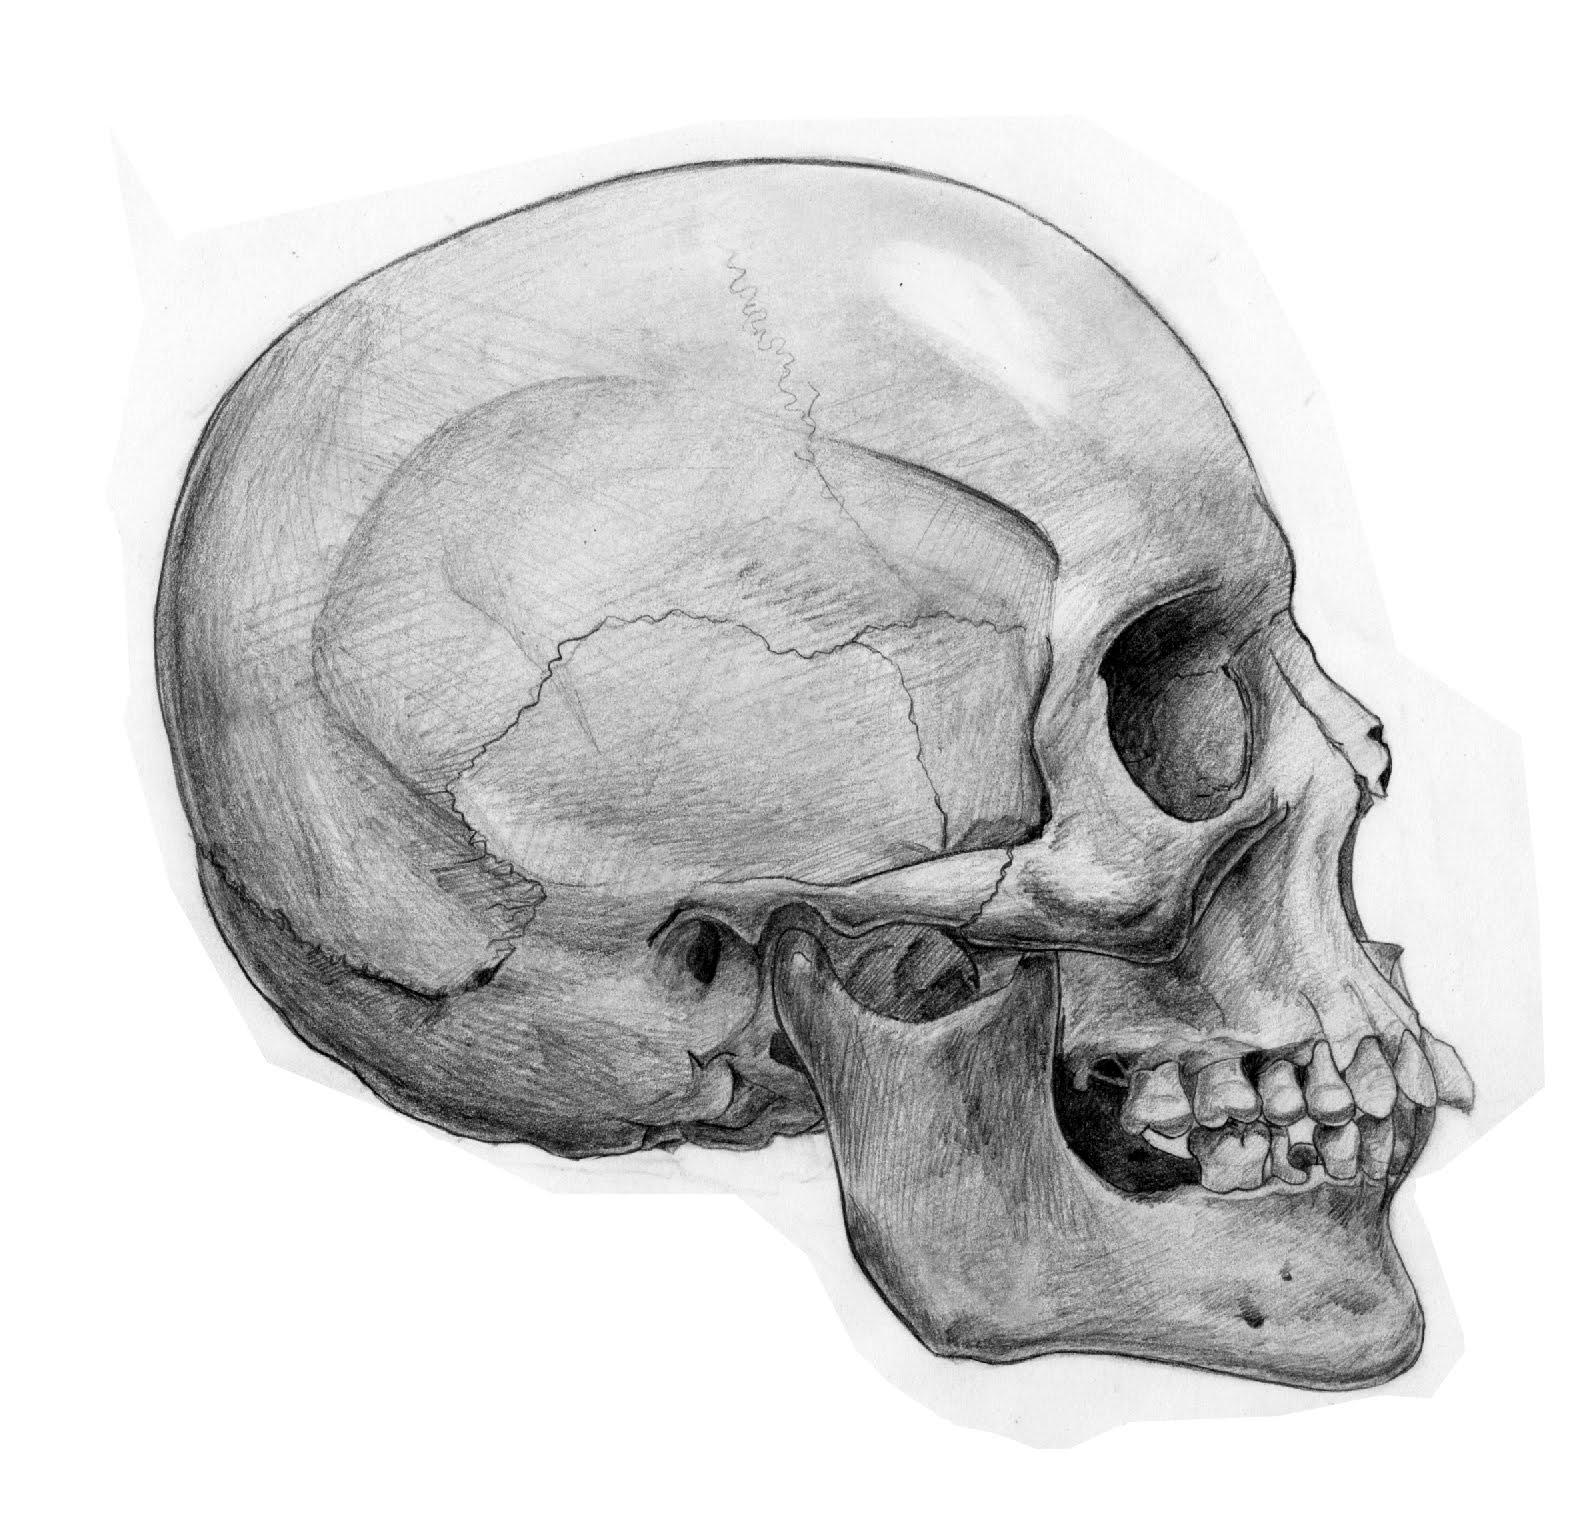 Drawn skull profile Human Skull profile skull drawing